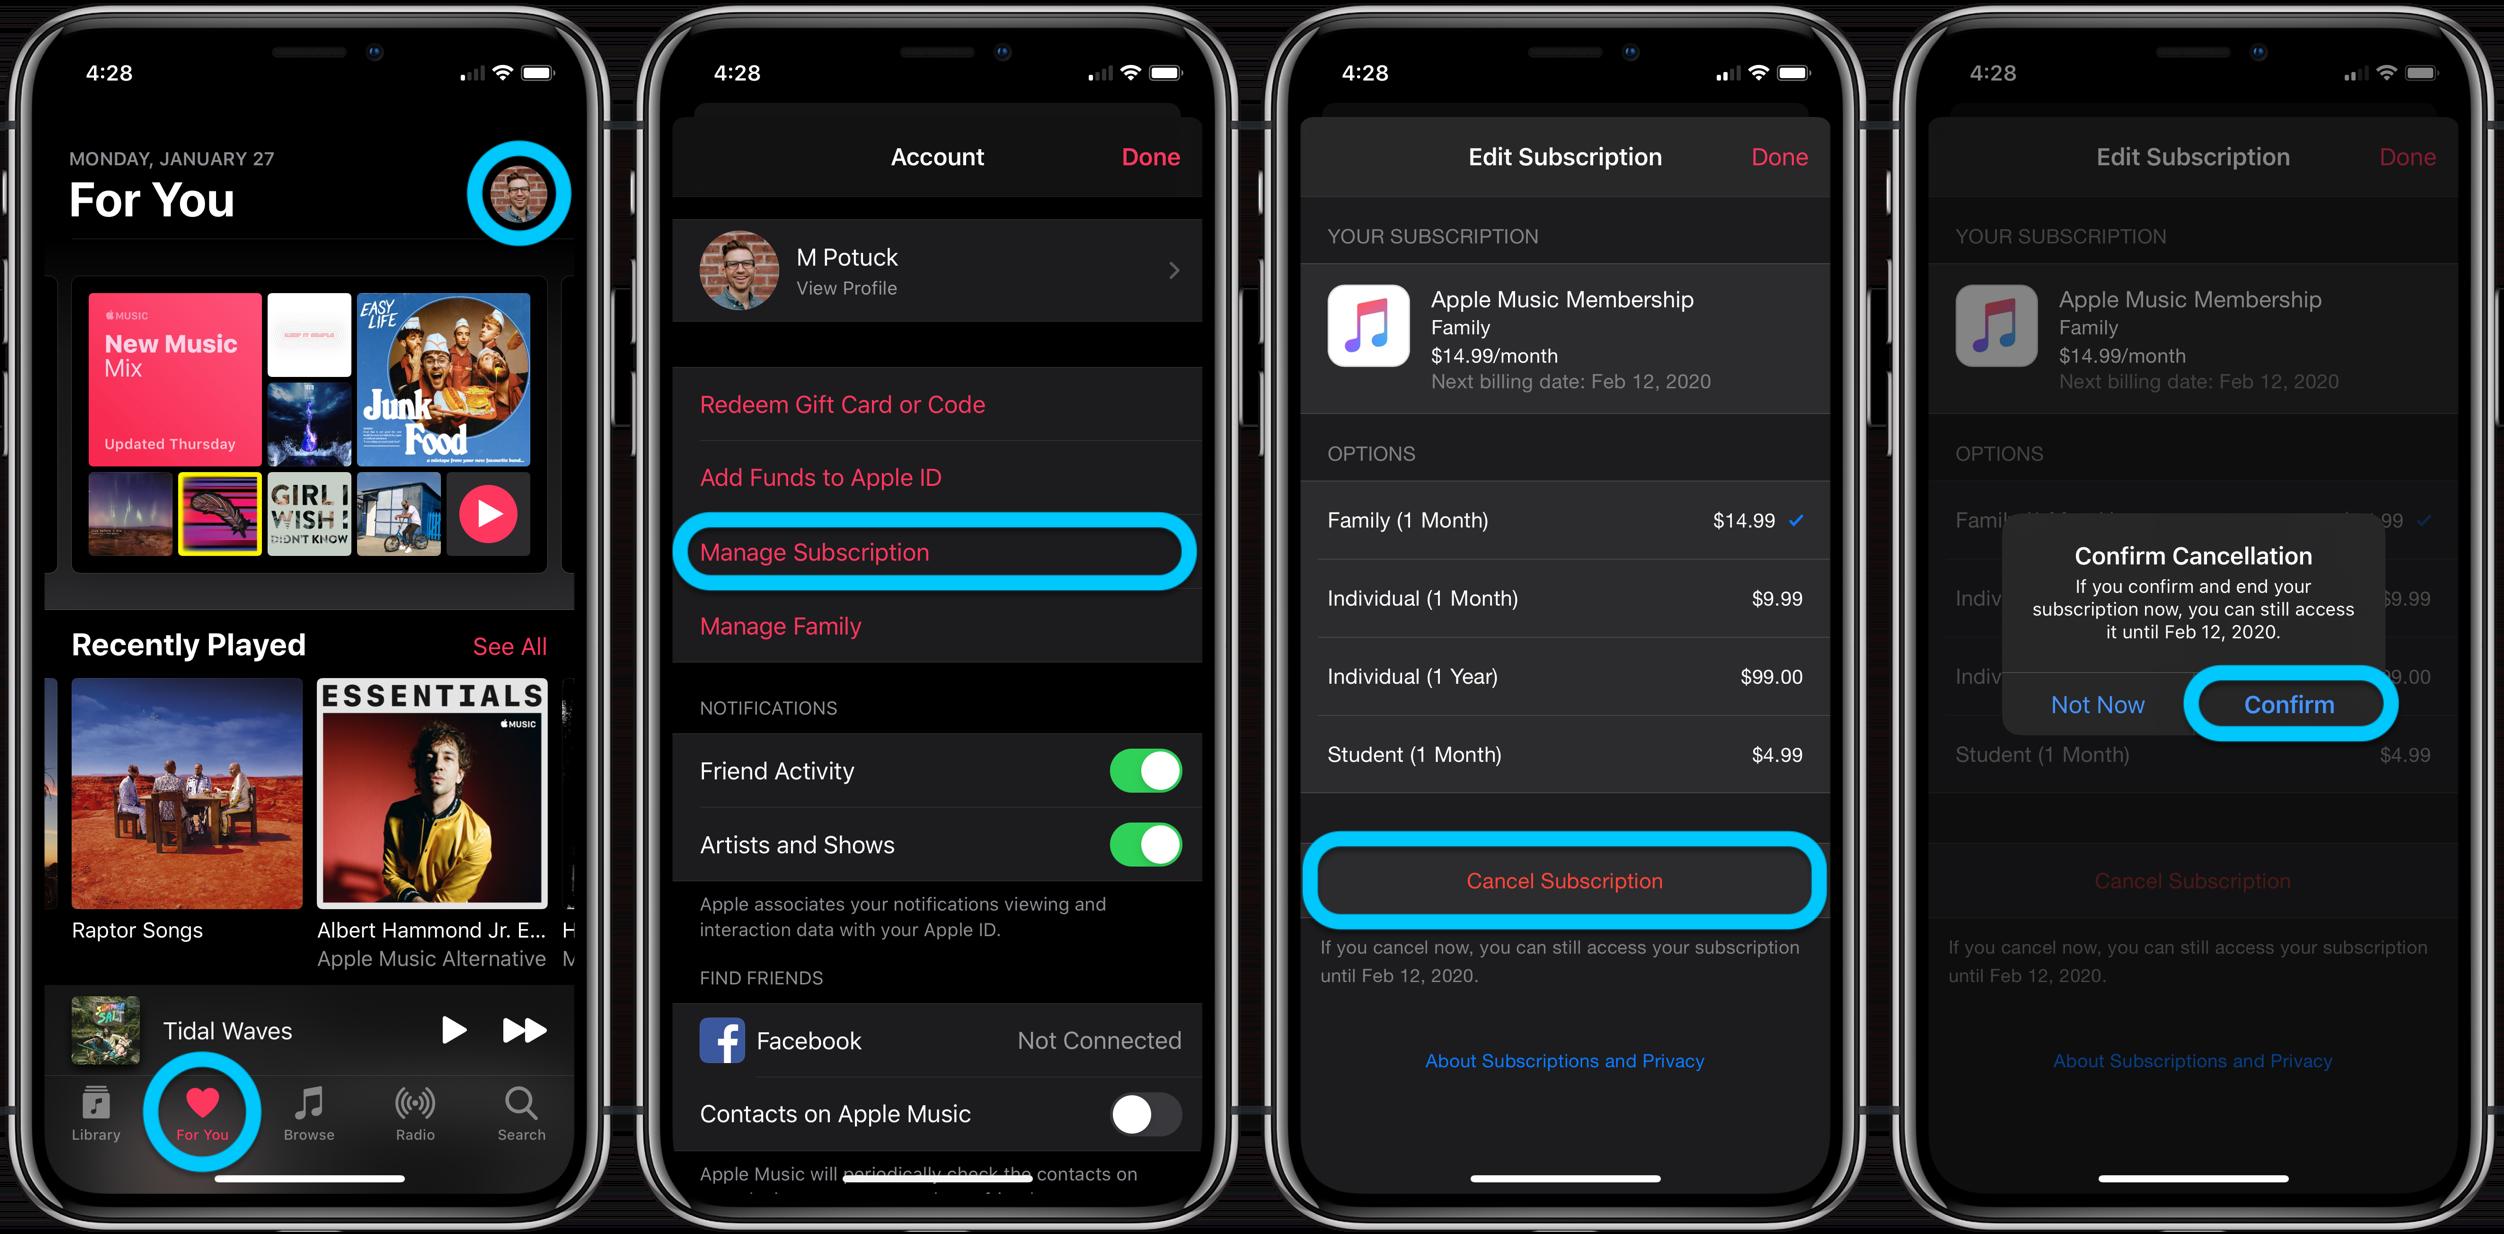 How to cancel Apple Music subscription walkthrough